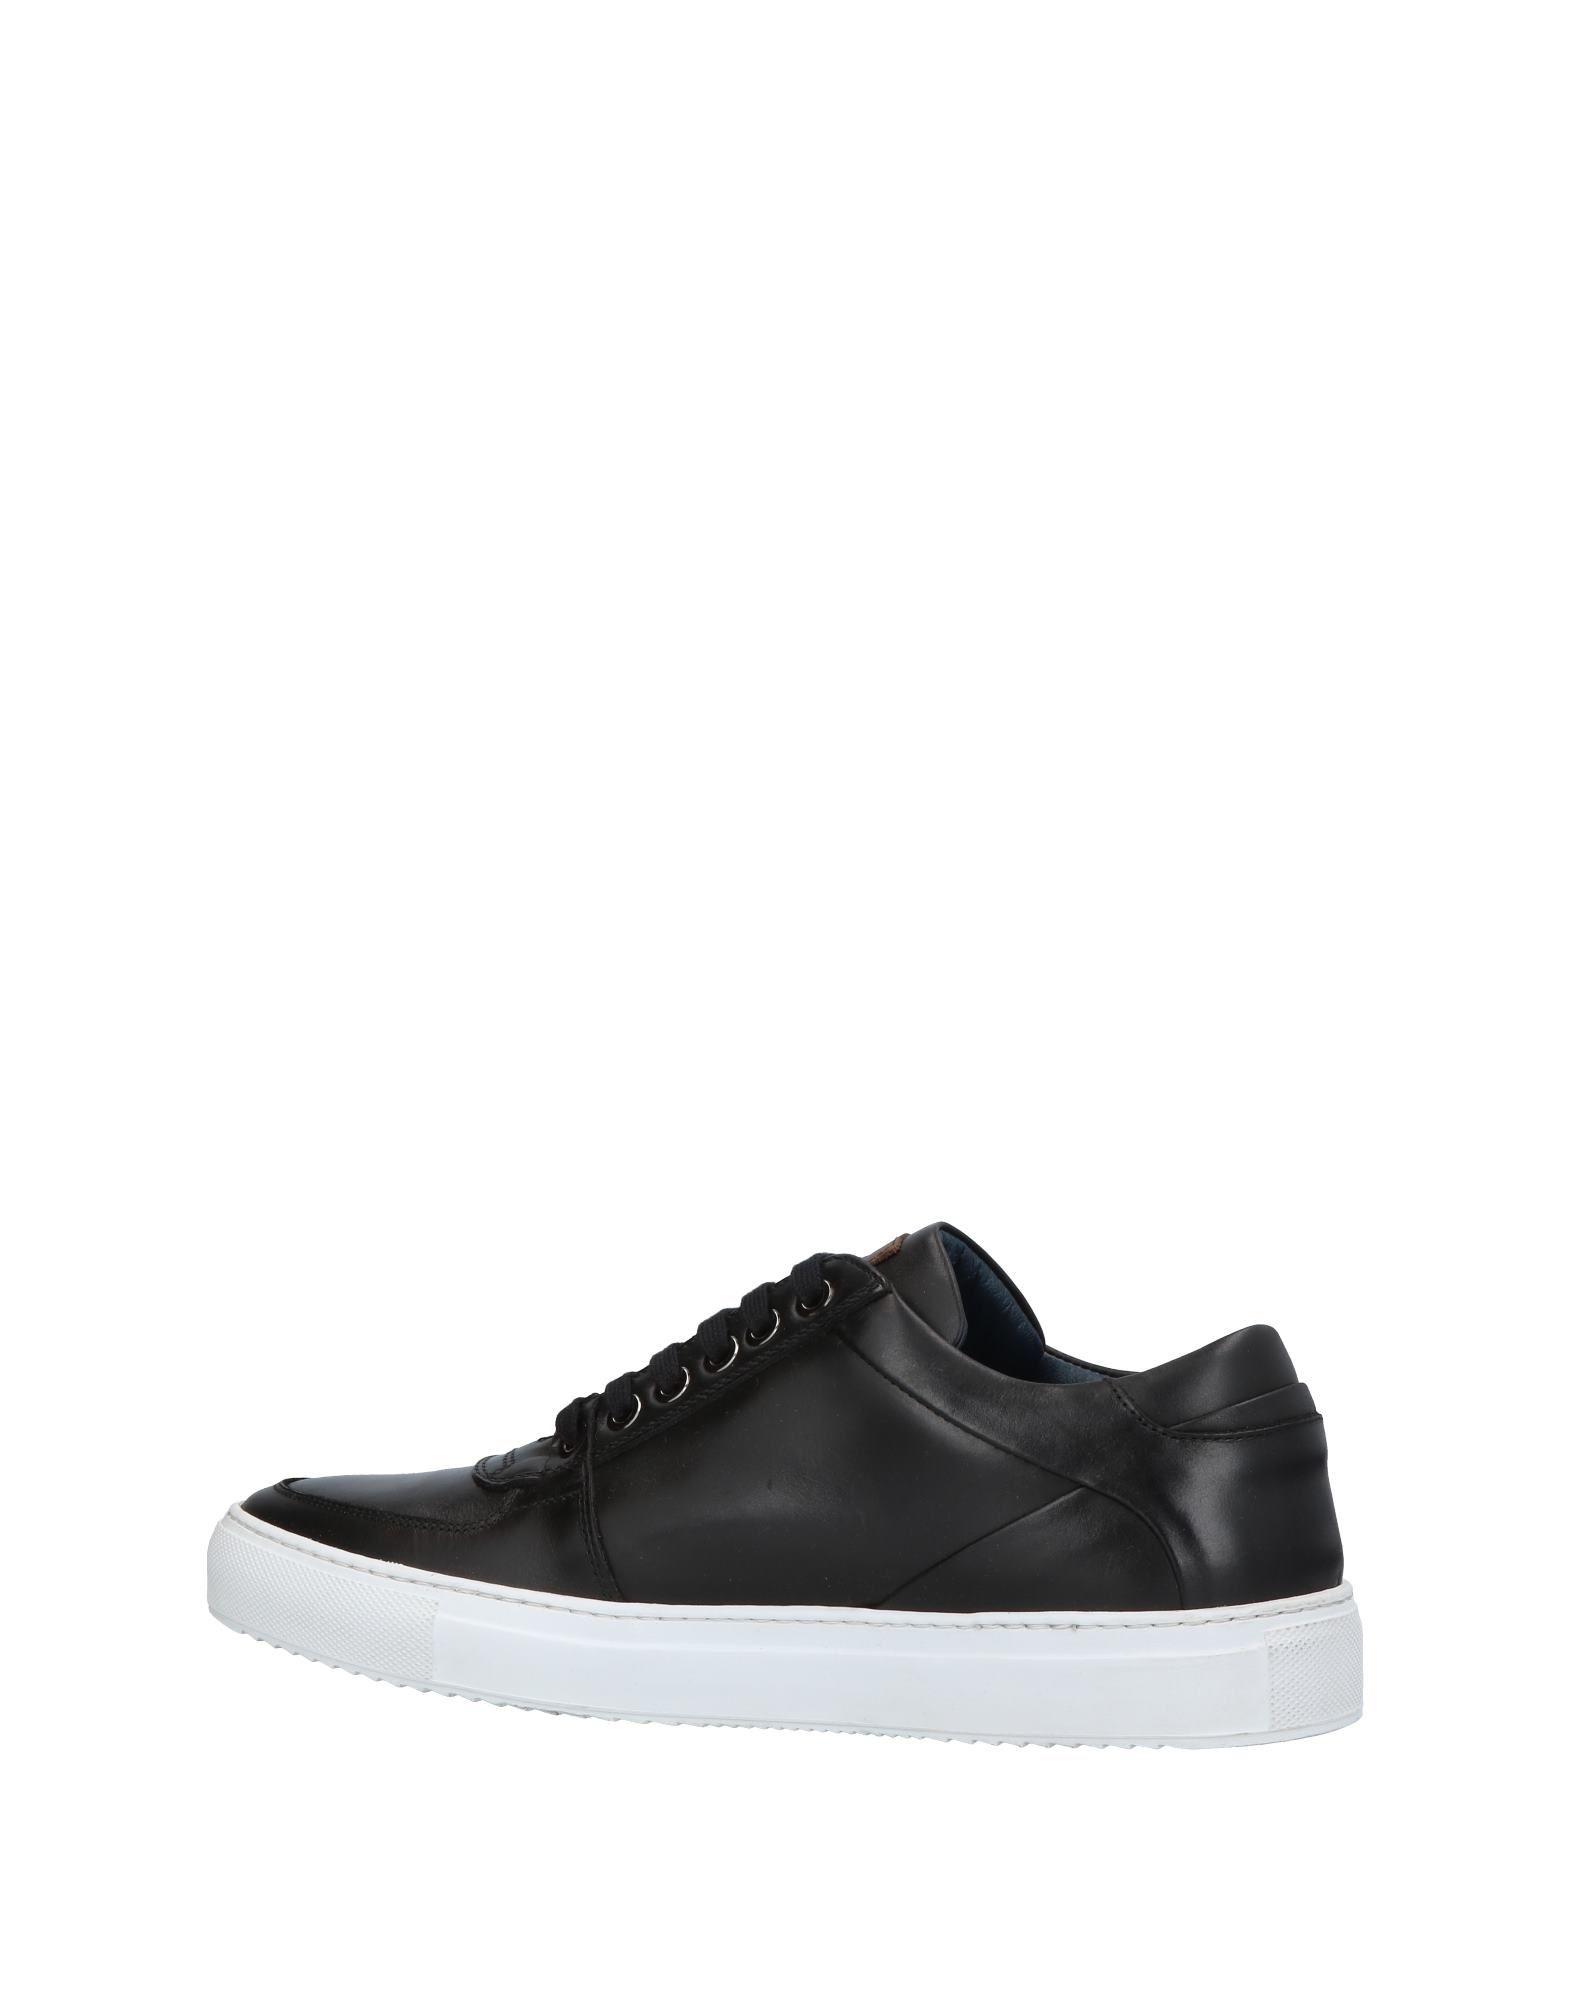 Sneakers Fabiano 11375259EO Ricci Uomo - 11375259EO Fabiano 30c022